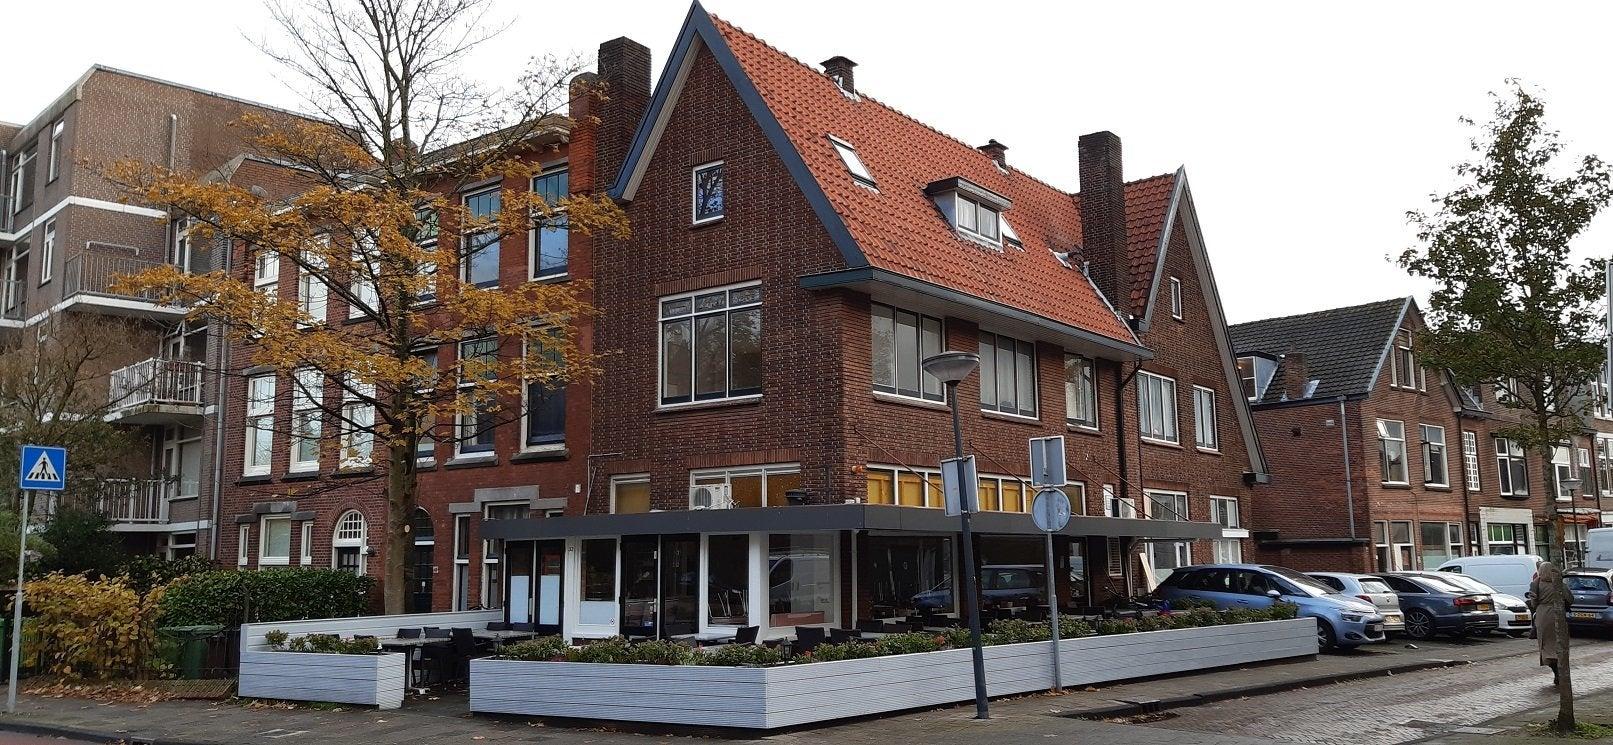 https://public.parariusoffice.nl/216/photos/huge/52265245.1574786991-224.jpg